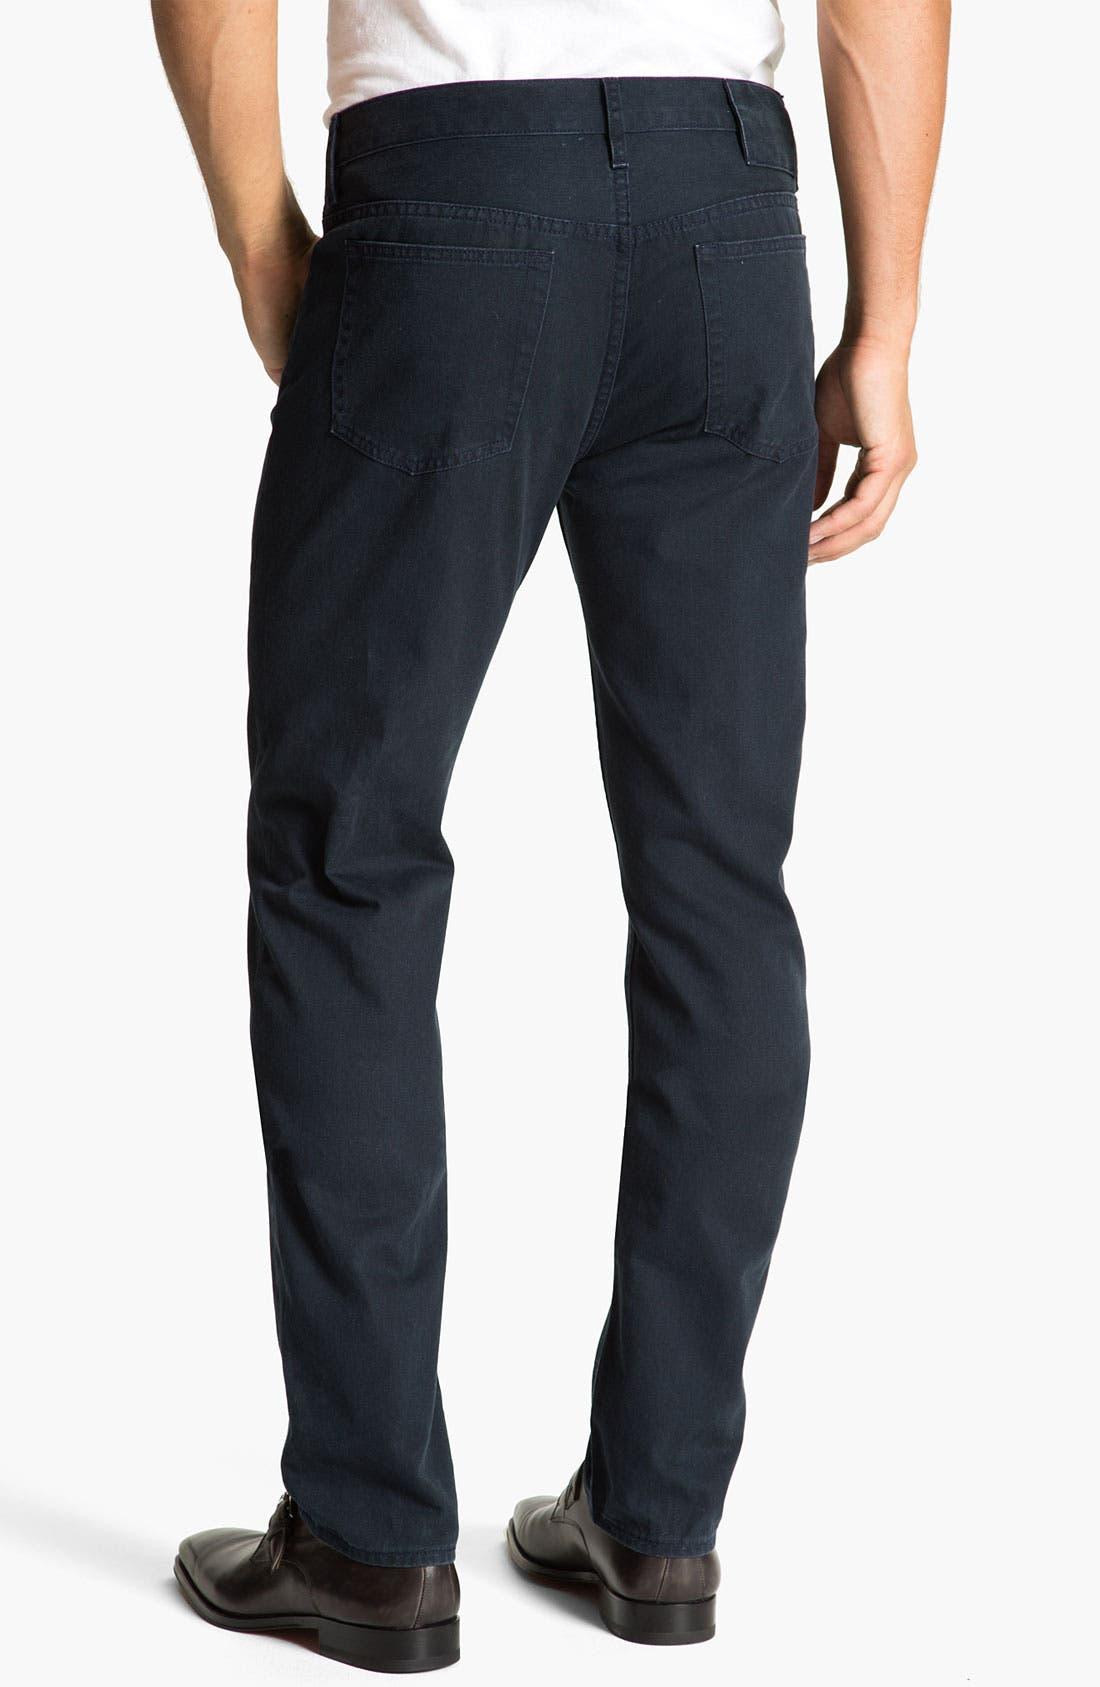 Alternate Image 1 Selected - MARC BY MARC JACOBS Slim Straight Leg Jeans (Darkest Teal)